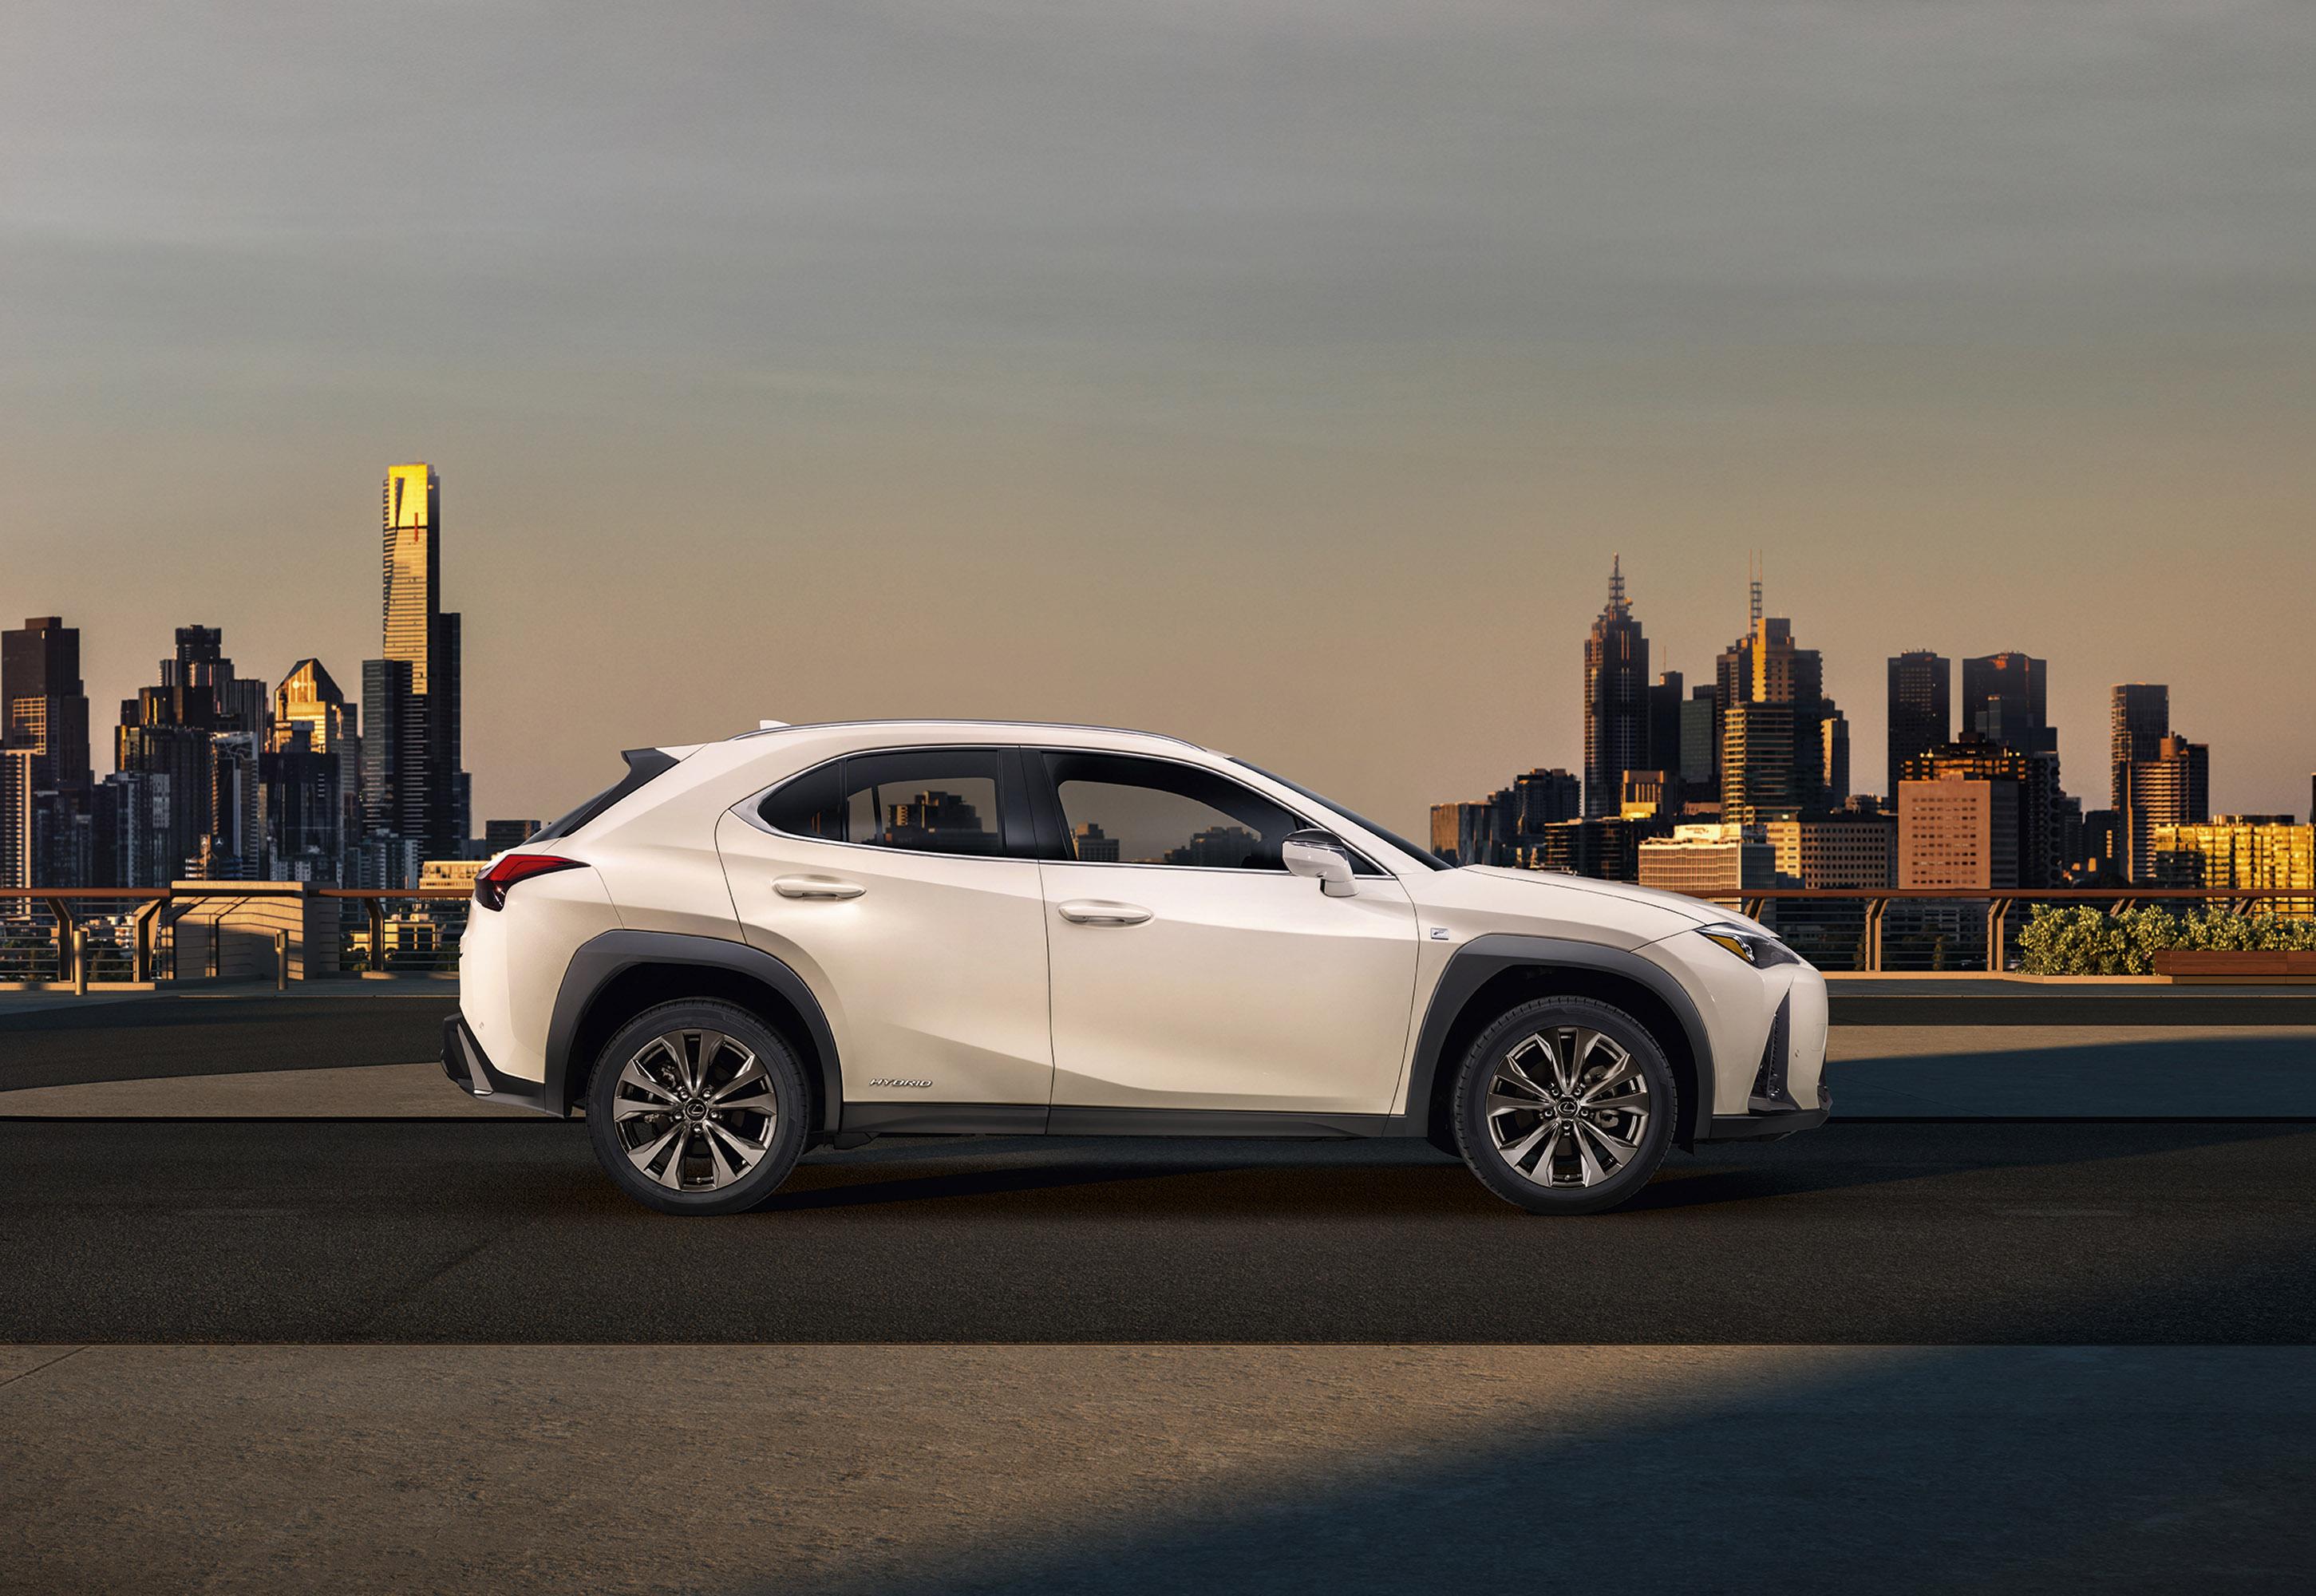 Lexus Reveals The New Ux Suv Model